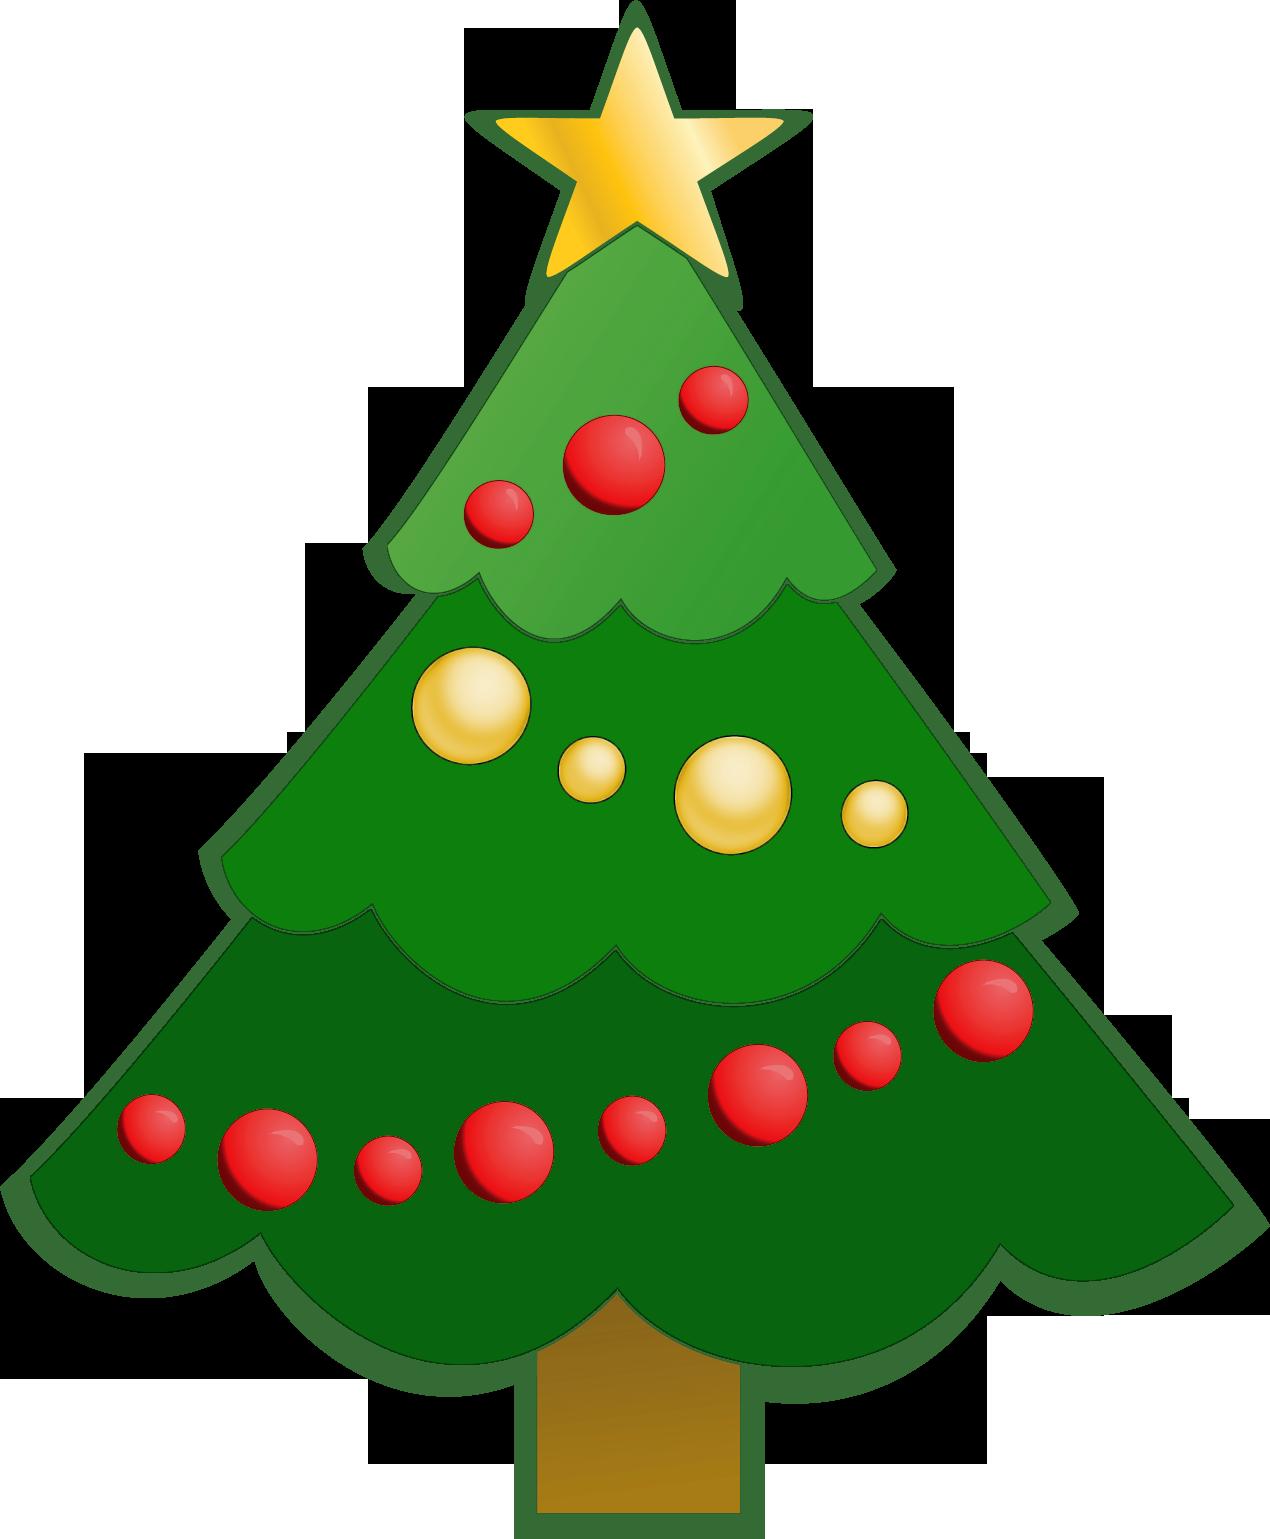 Simple Christmas Tree Clipart.